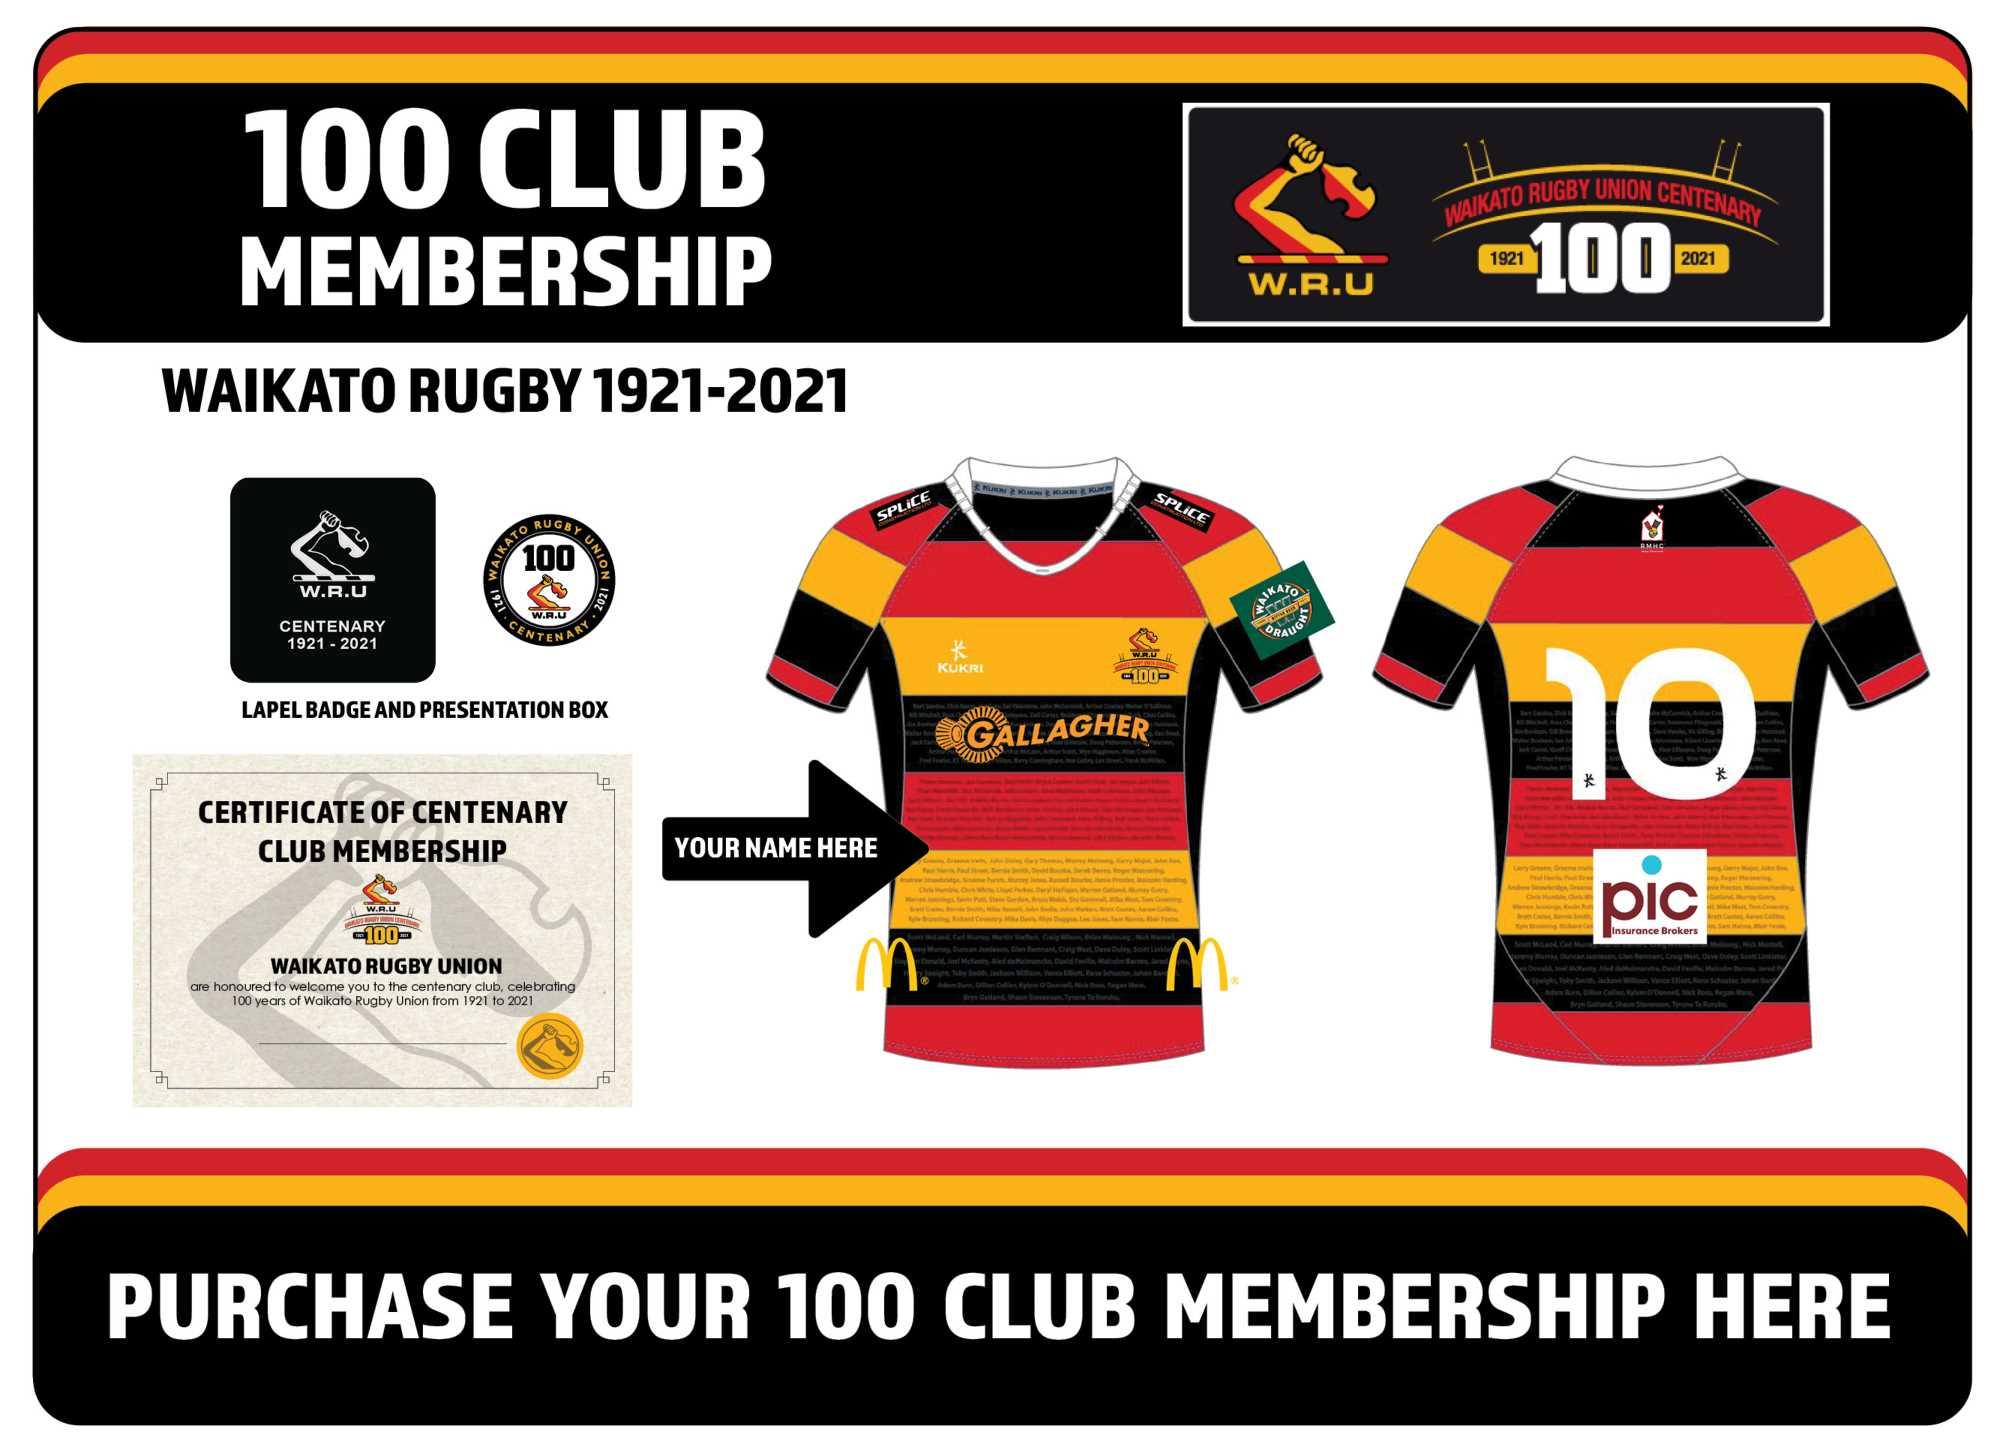 Waikato Rugby Union launch 100 Club Membership